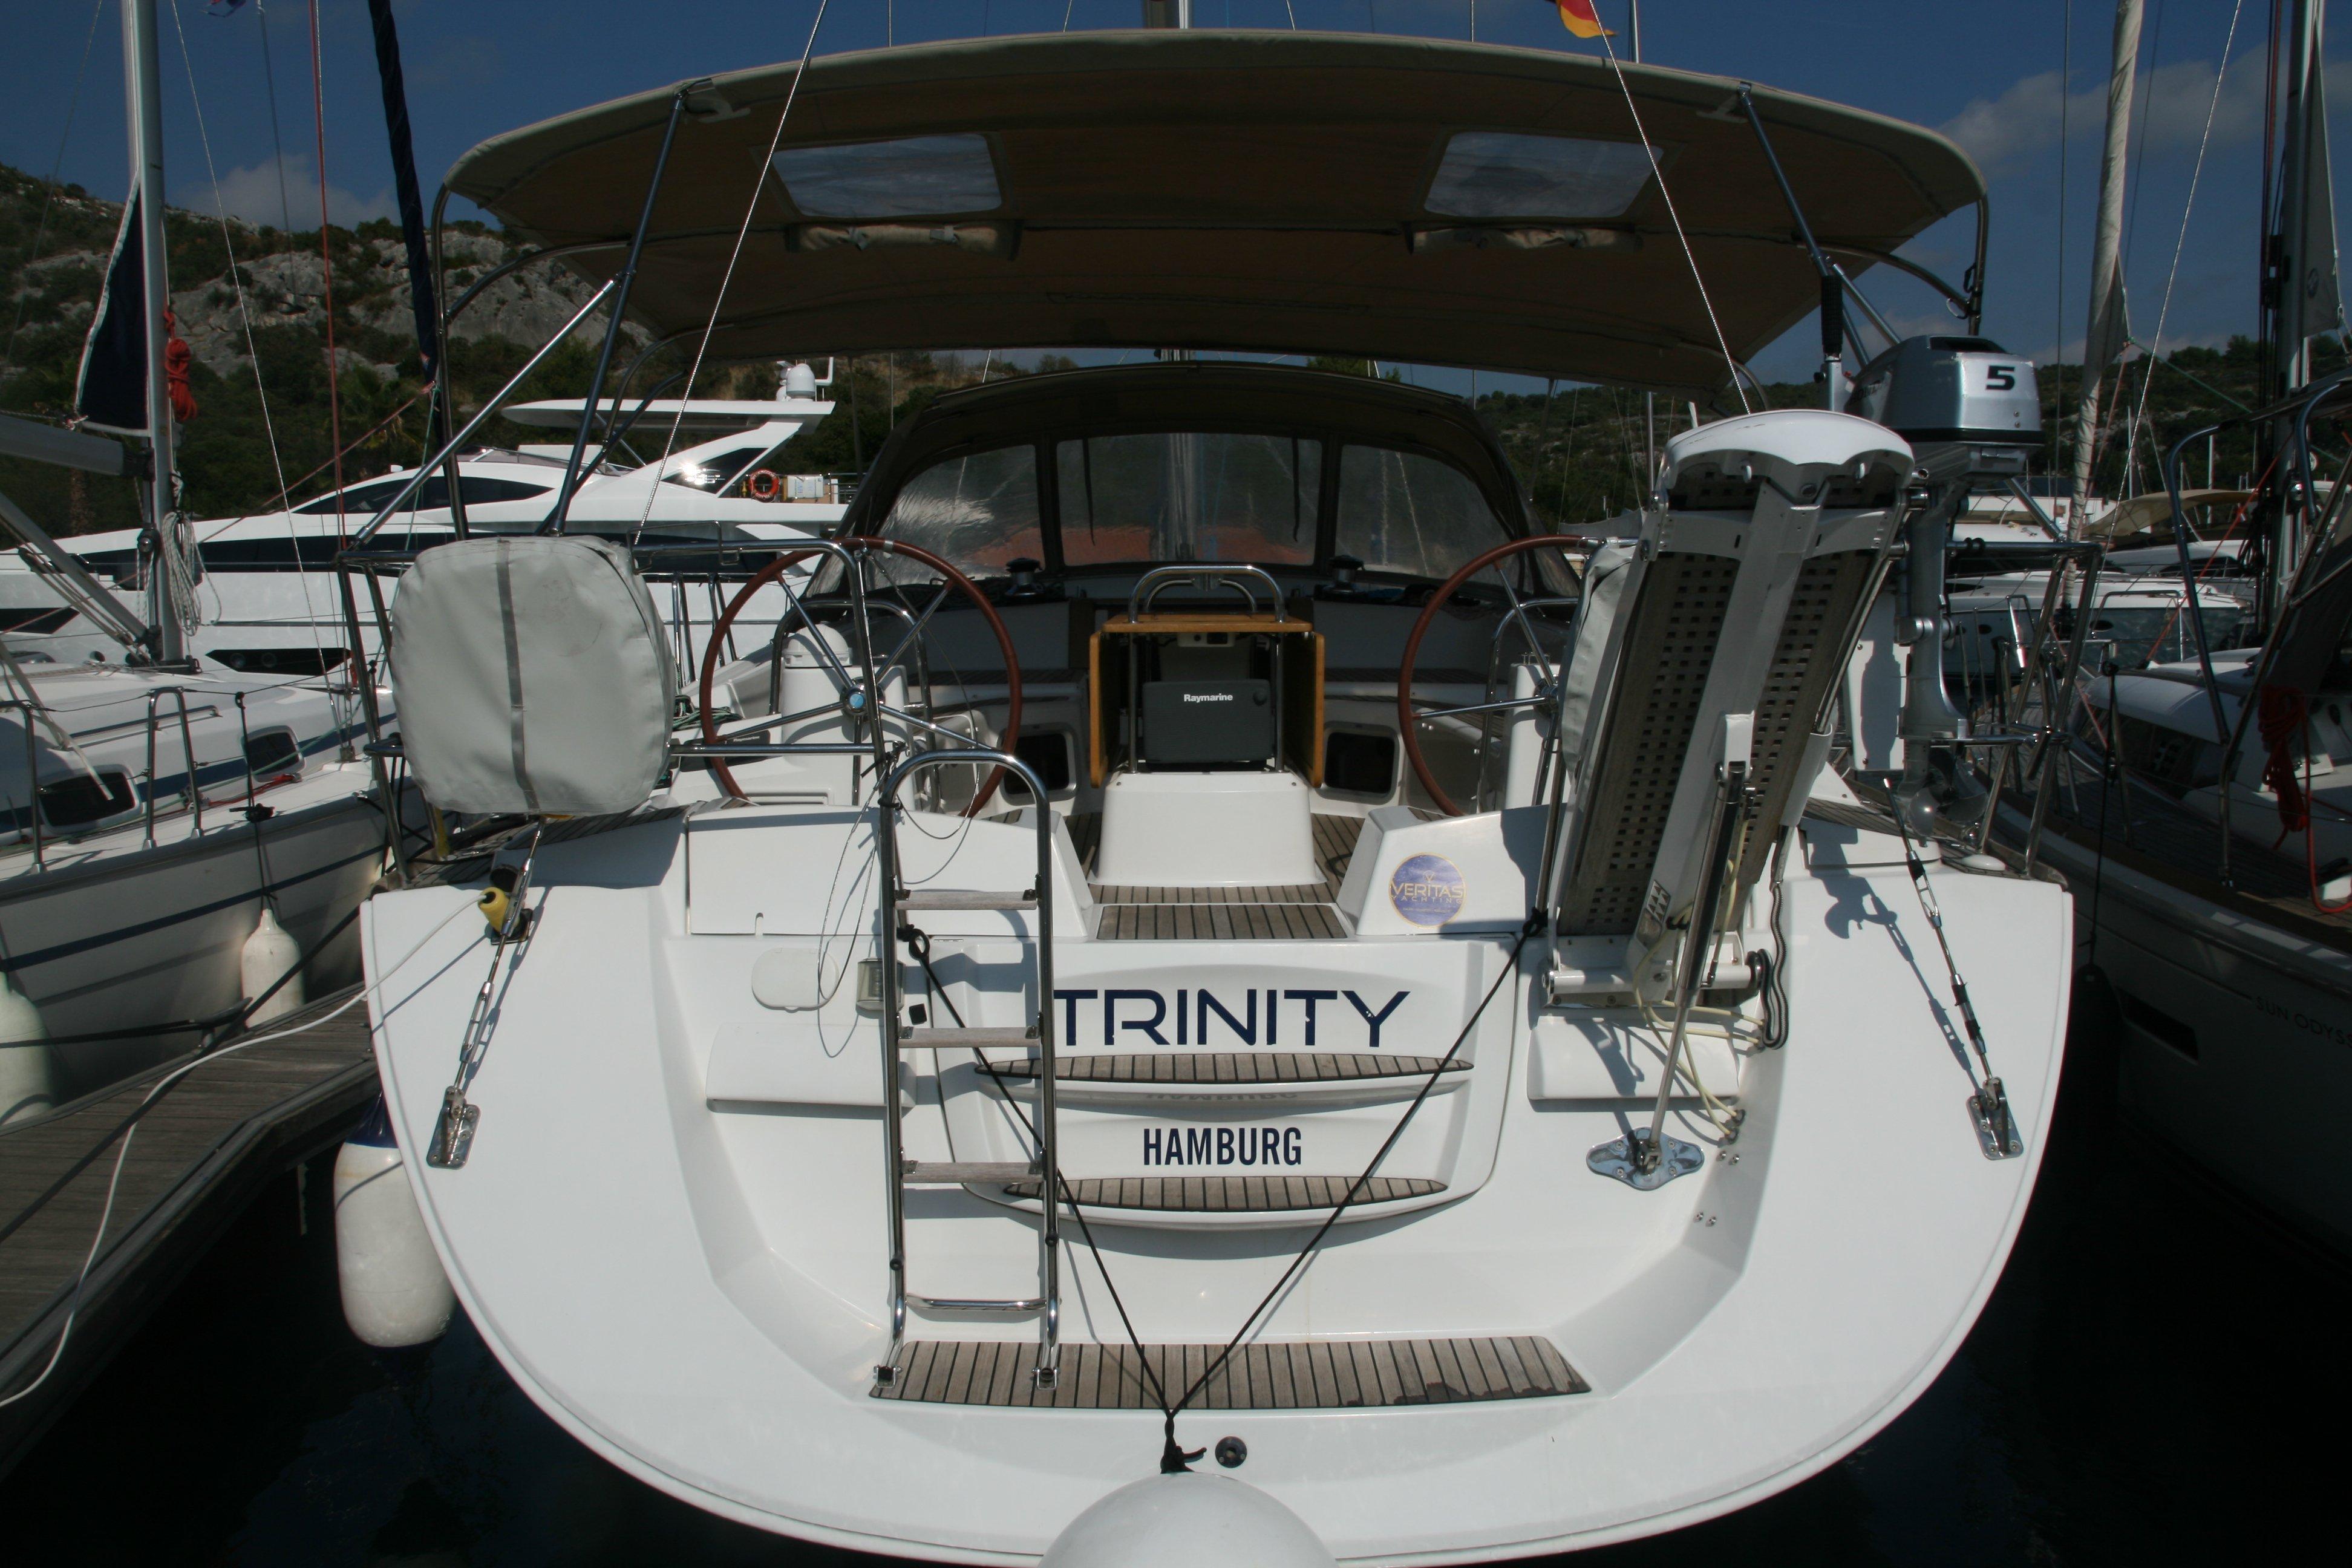 Jeanneau 53 (4cab) (Trinity)  - 27